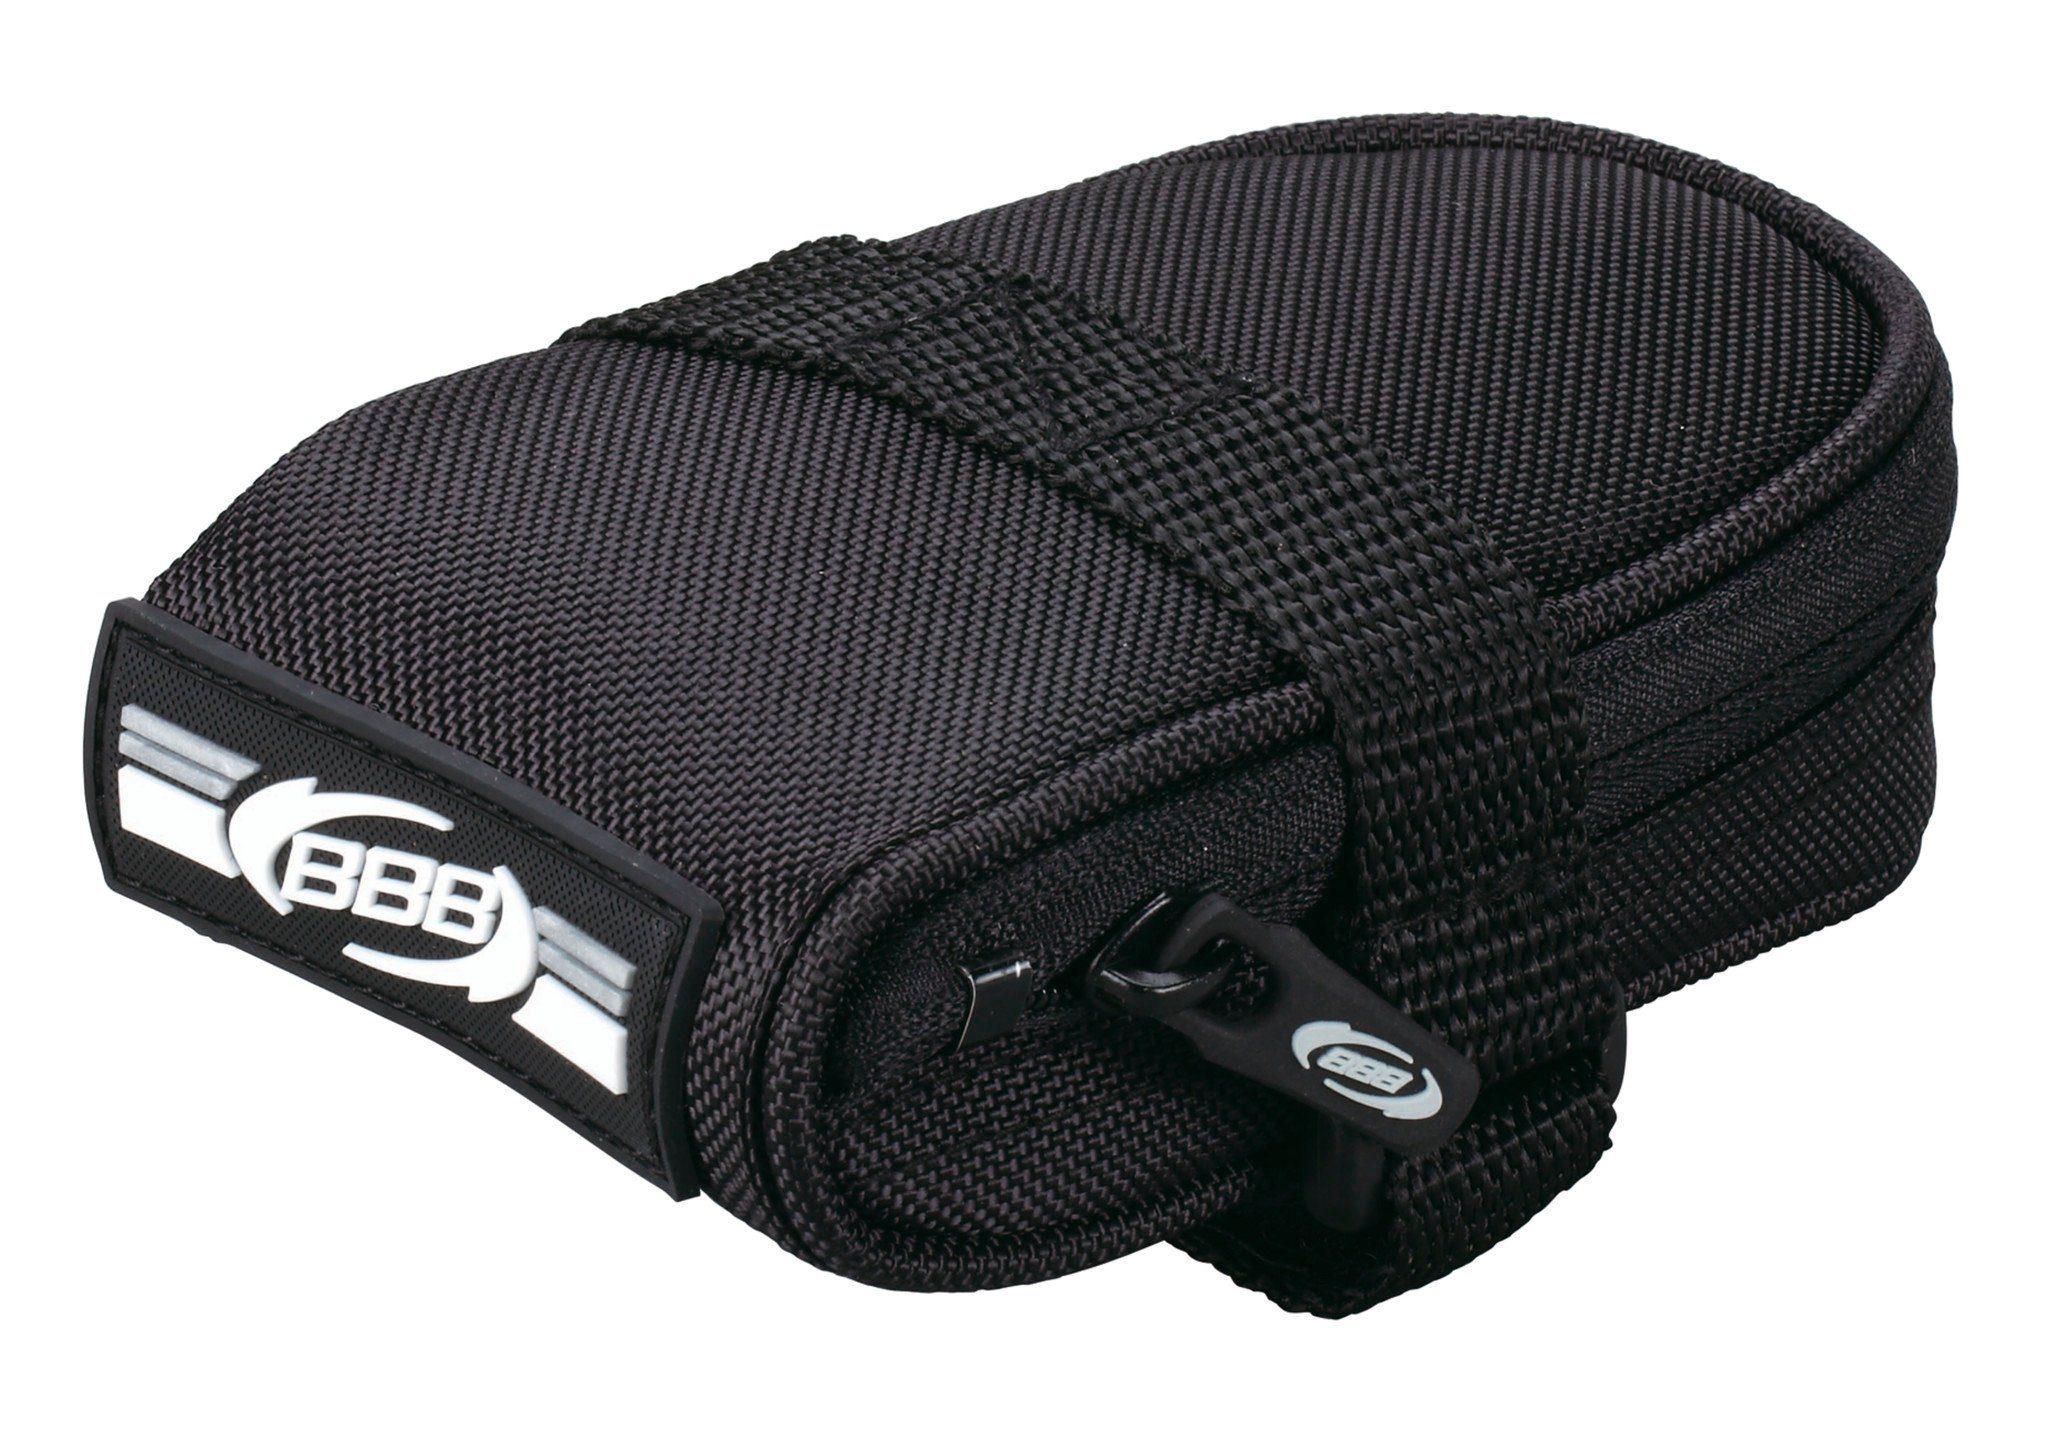 BBB Fahrradtasche »RacePack BSB-14 Satteltasche«